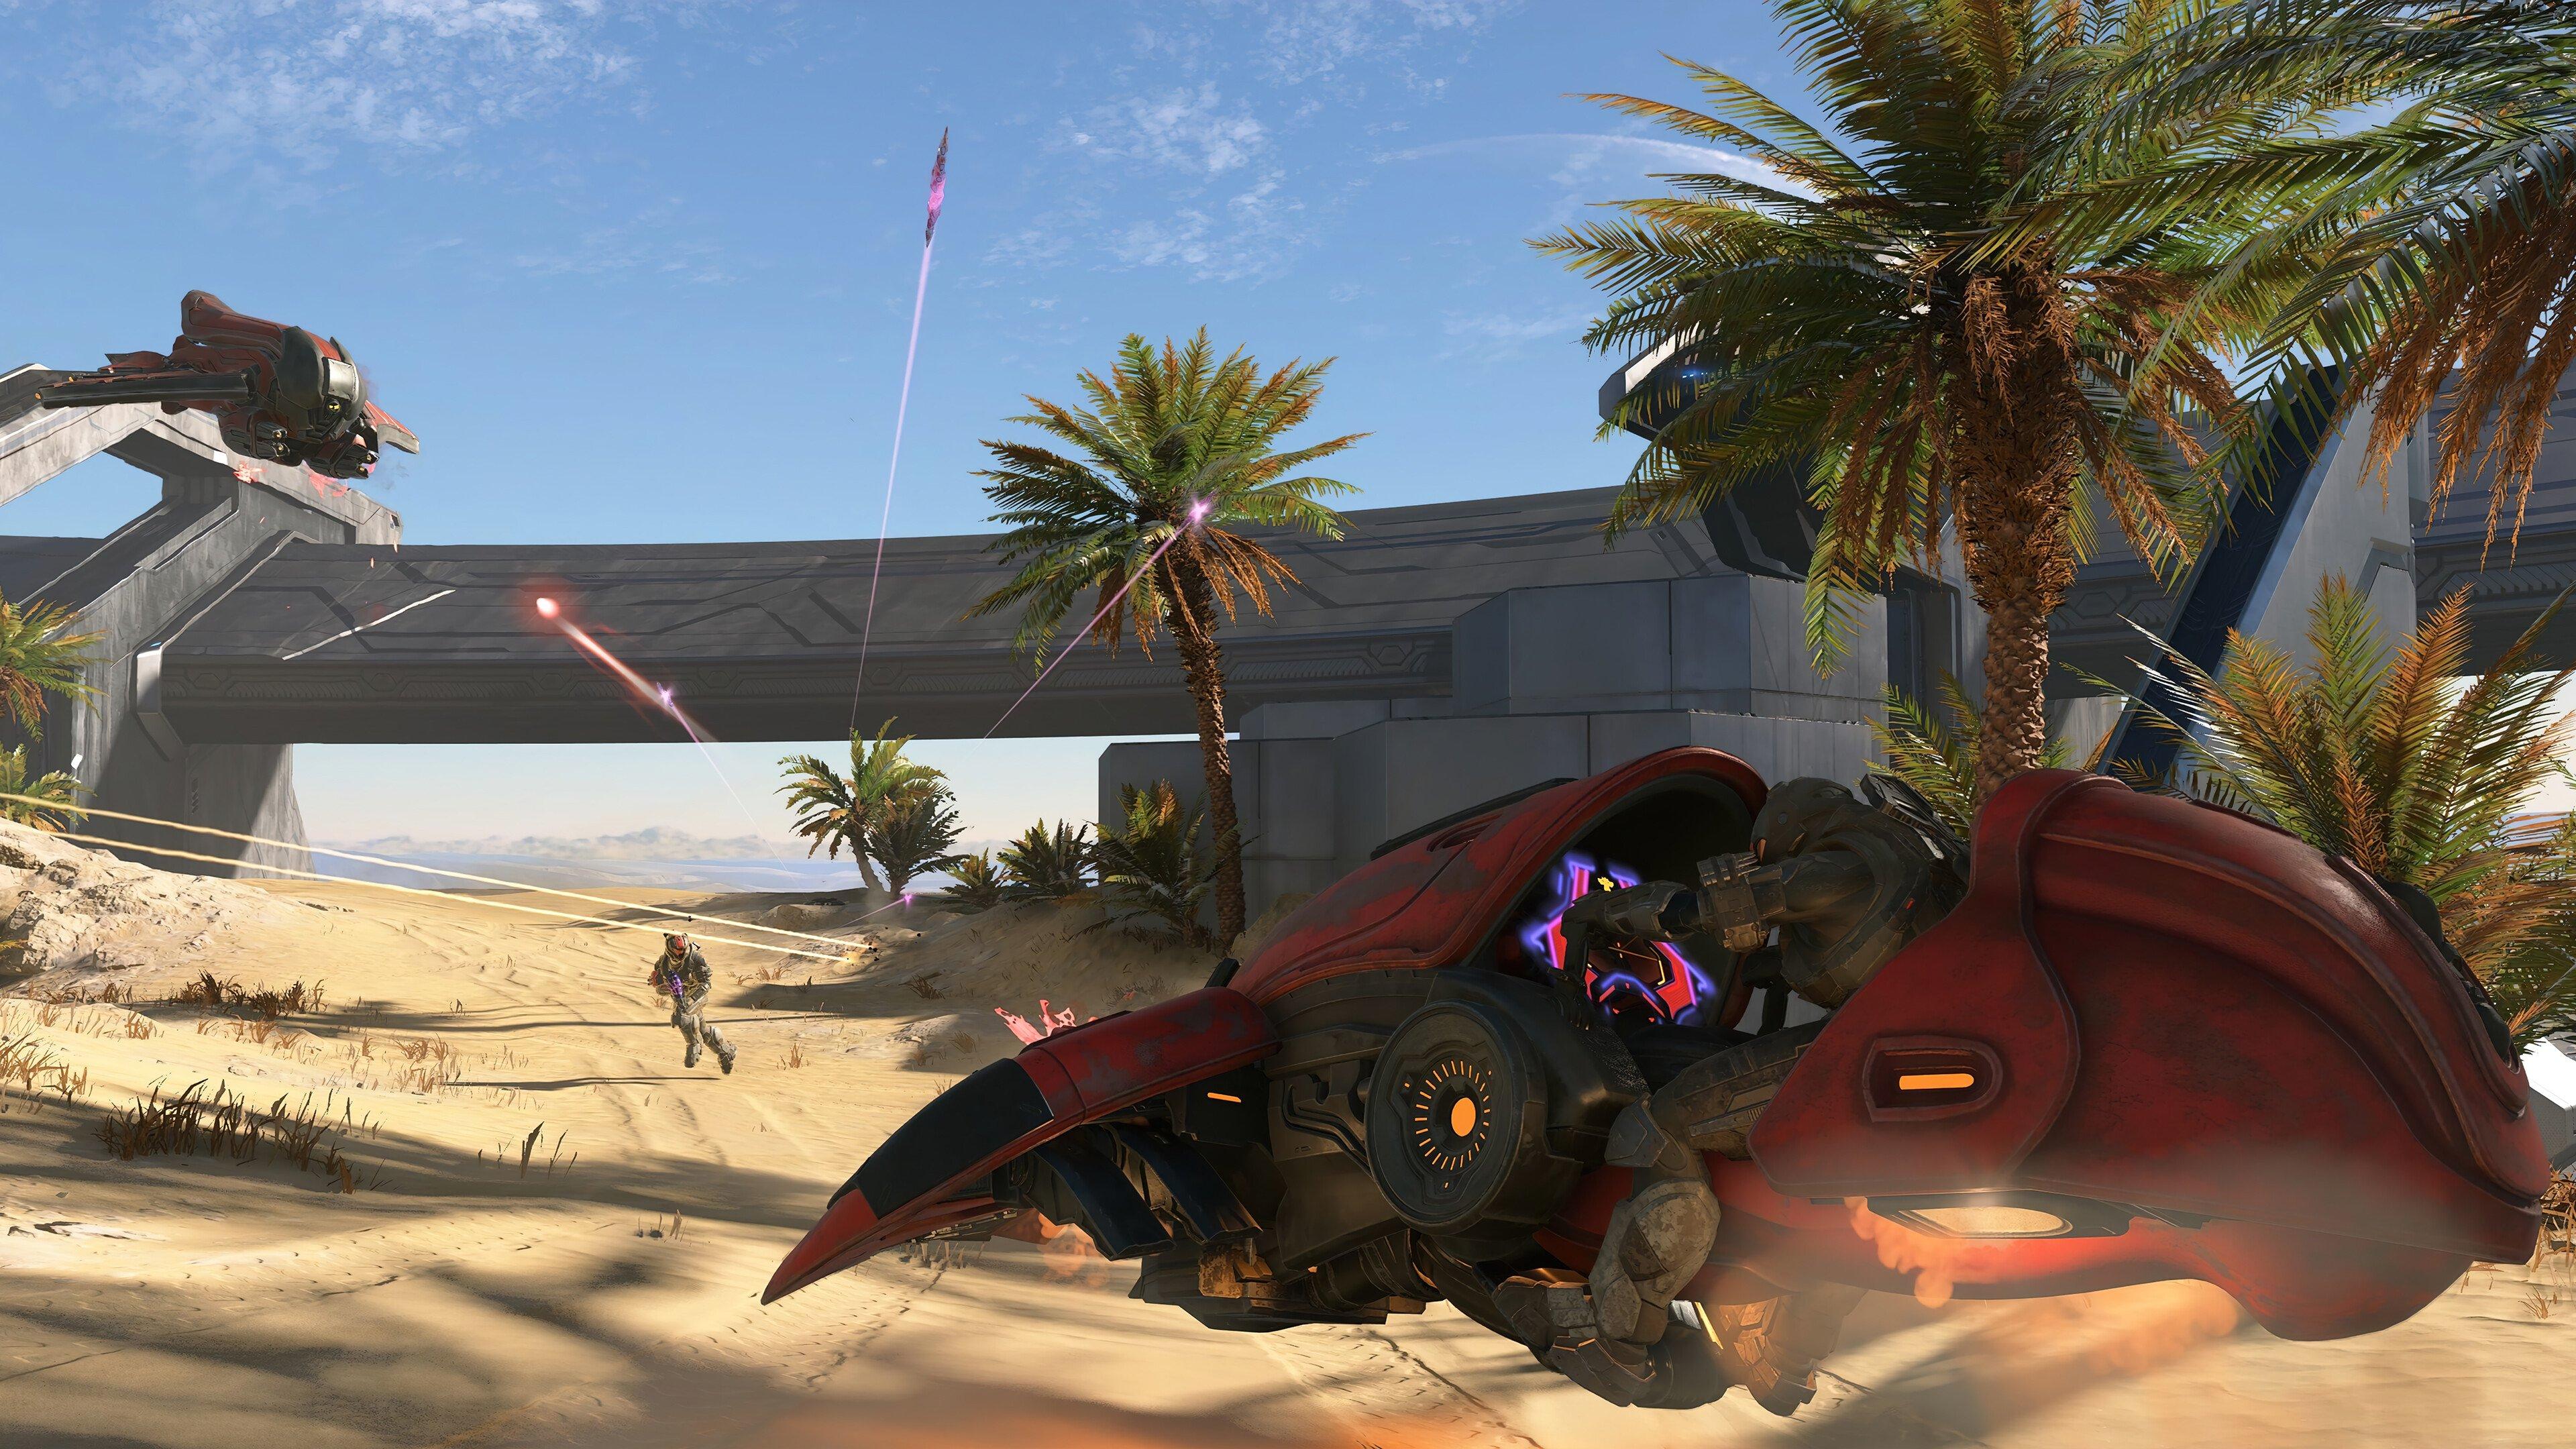 Wallpaper Halo Infinite Game Multiplayer